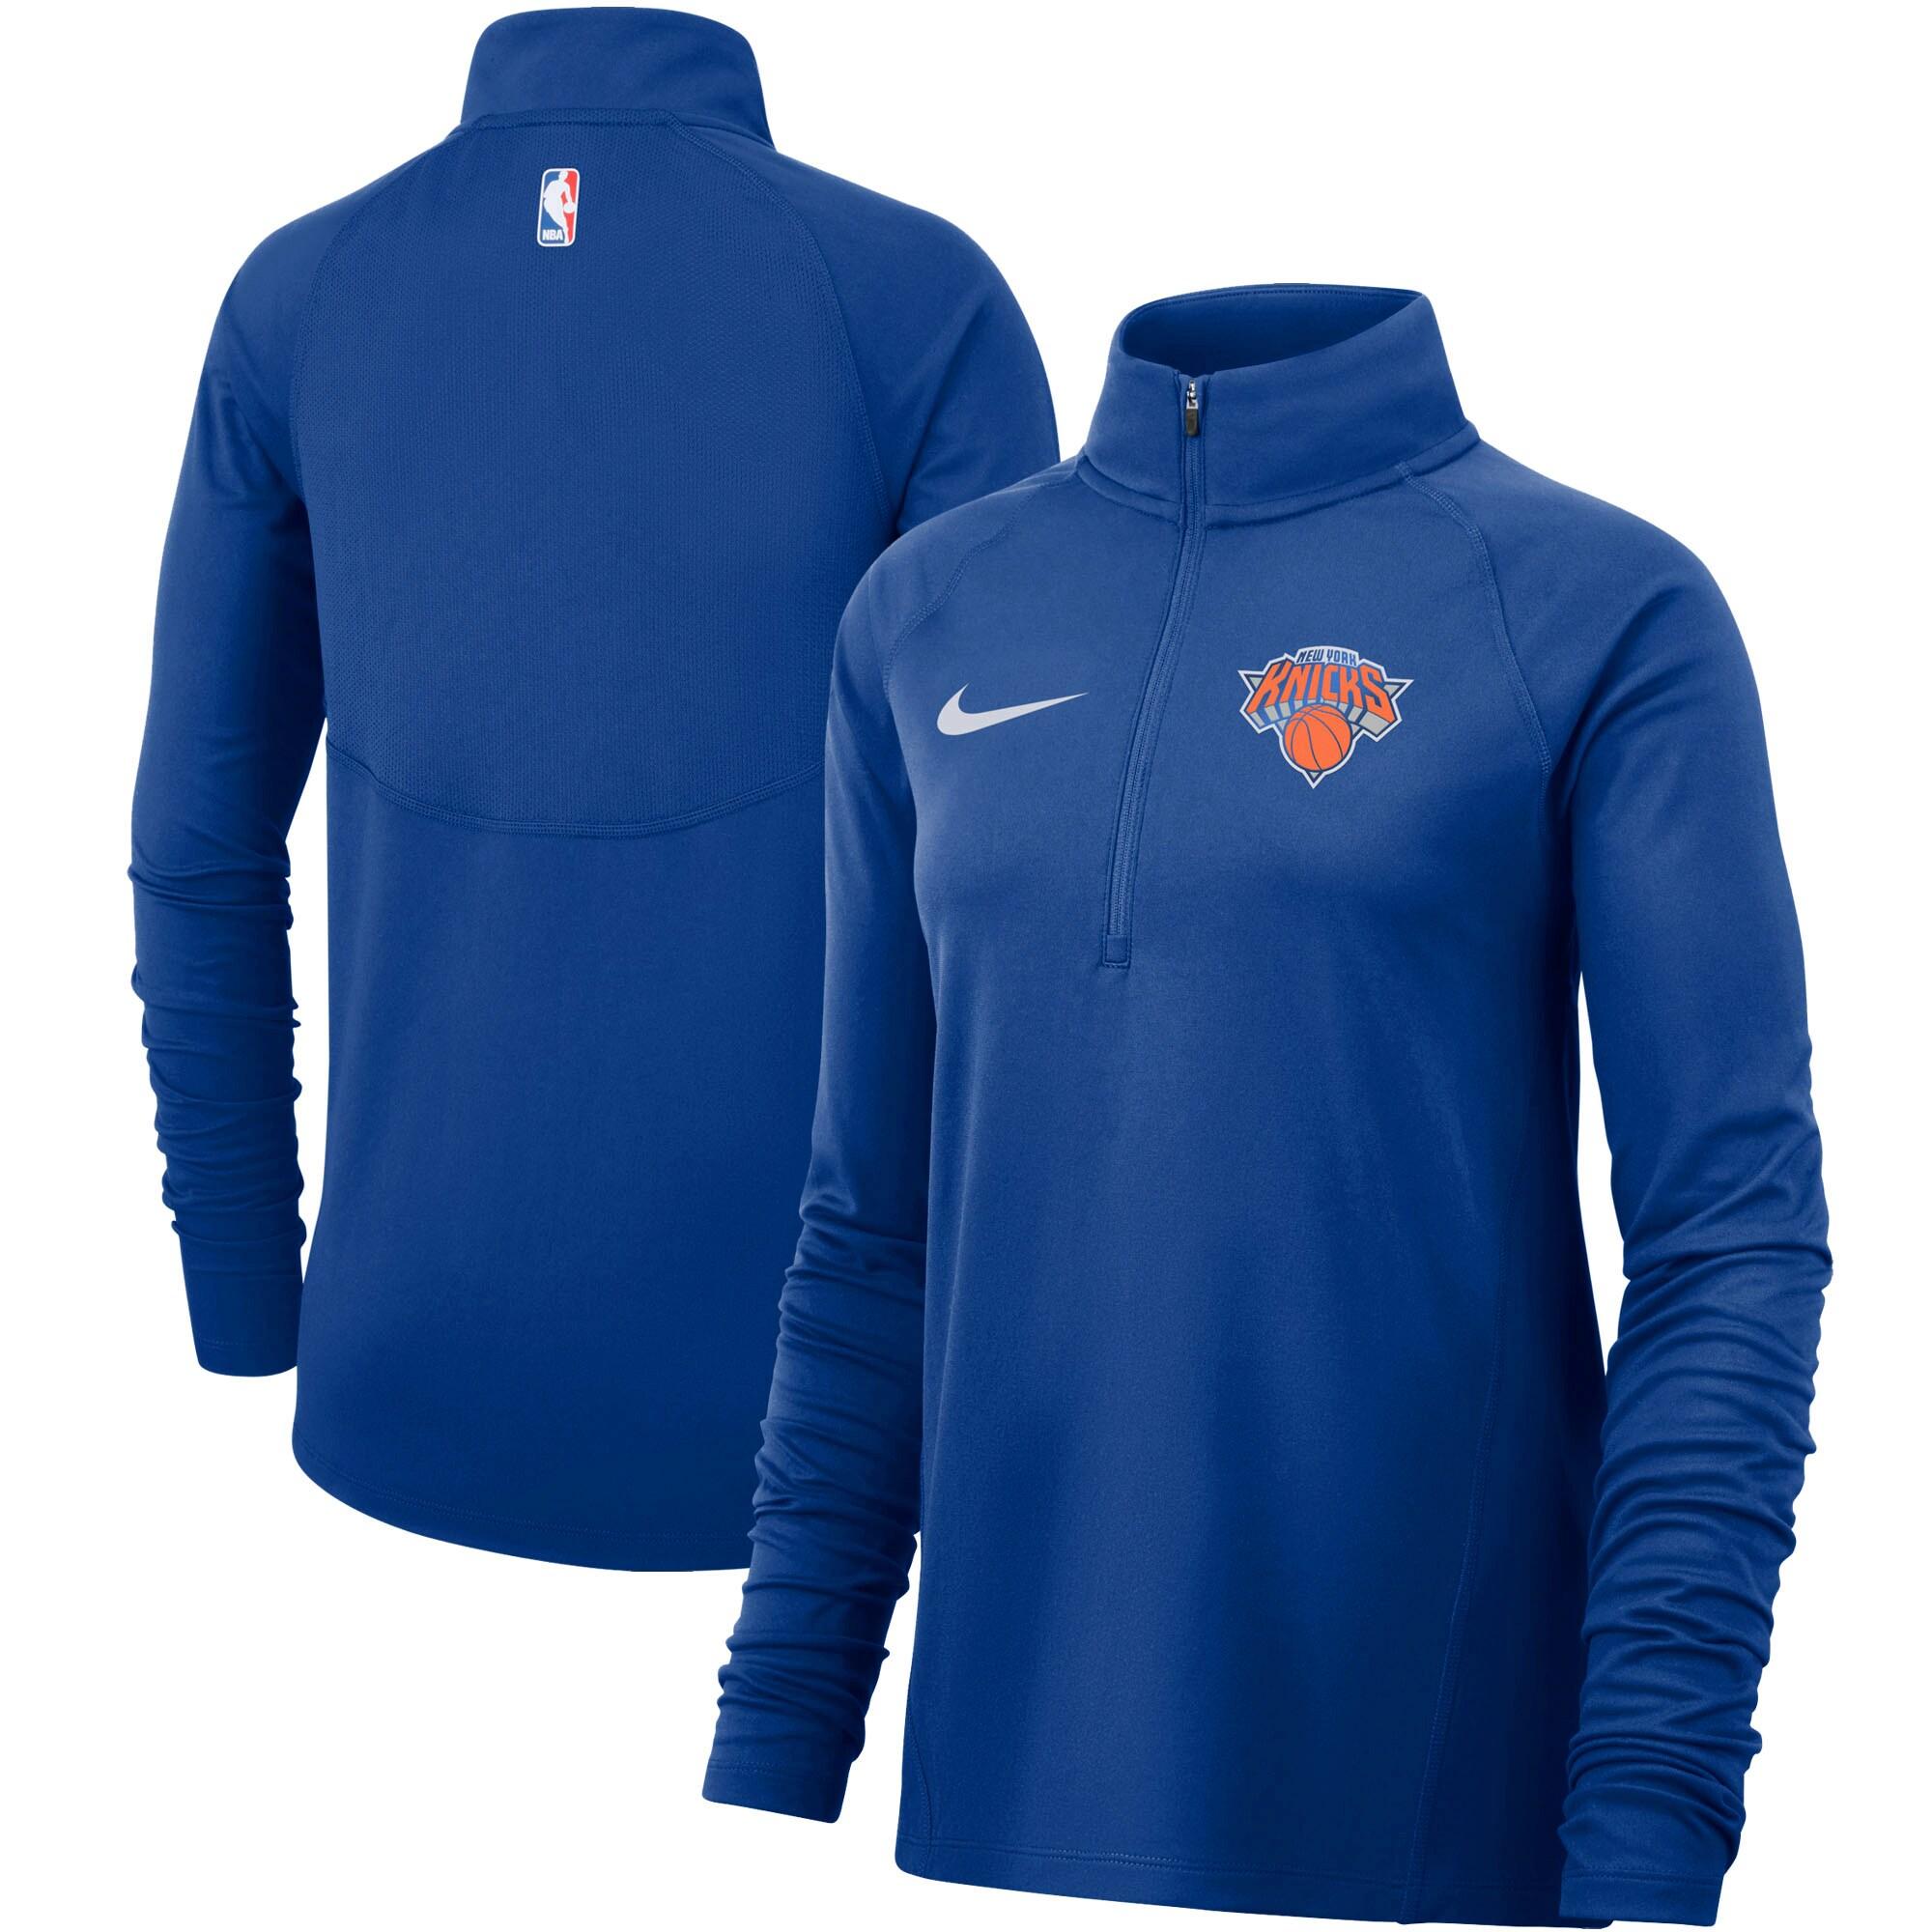 New York Knicks Nike Women's Element Performance Raglan Sleeve Half-Zip Pullover Jacket - Blue